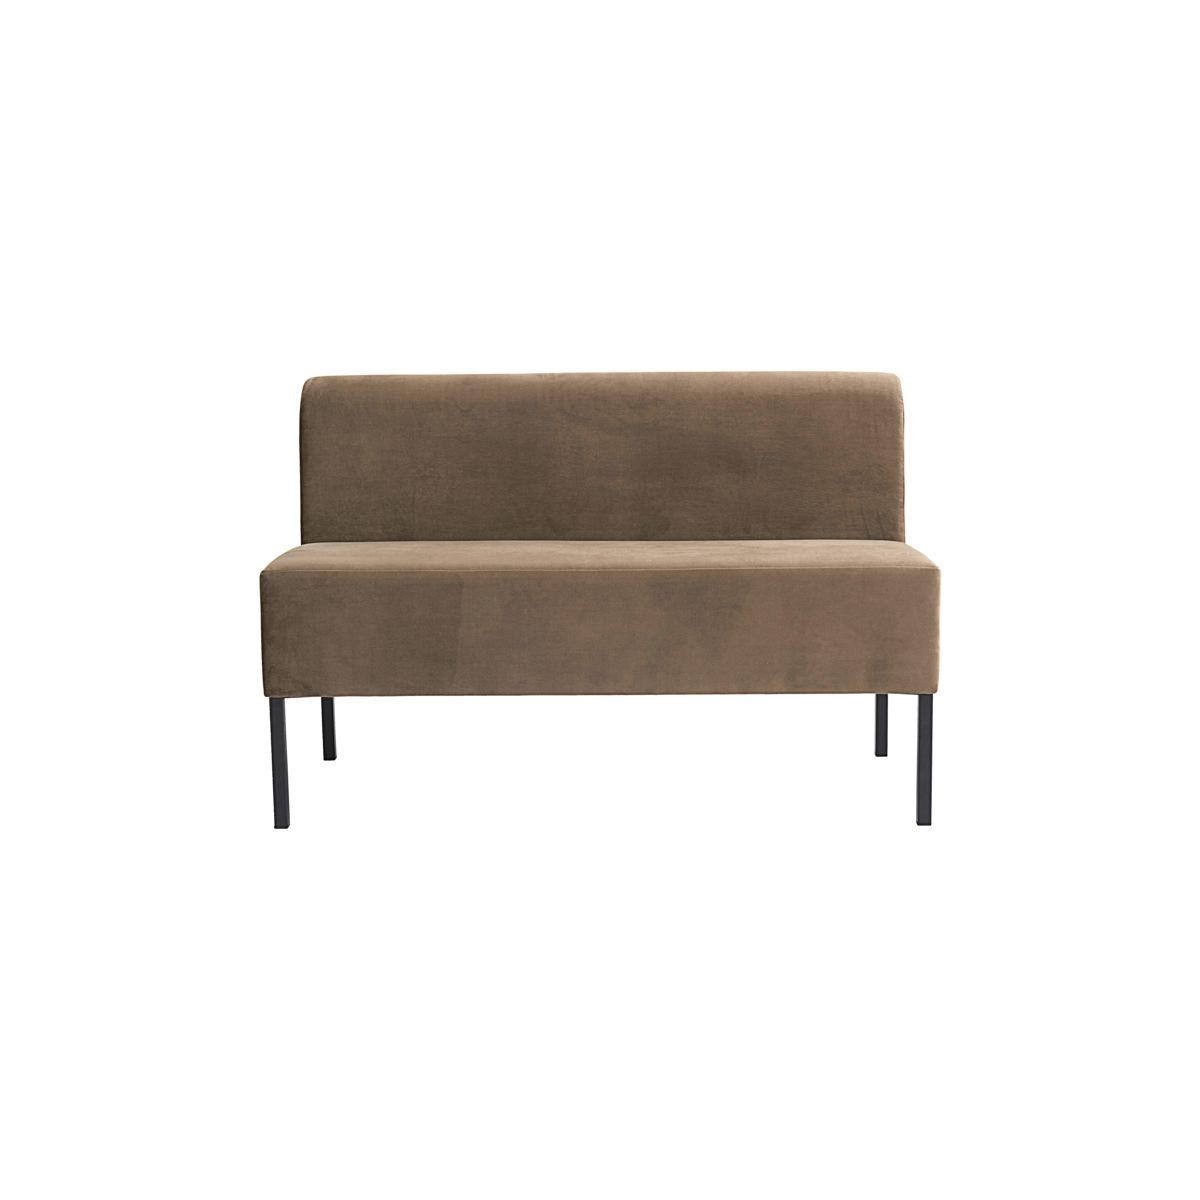 house doctor – House doctor sand sofa modul - sandfarvet stof og sorte ben, 2-pers. (120x60) på boboonline.dk